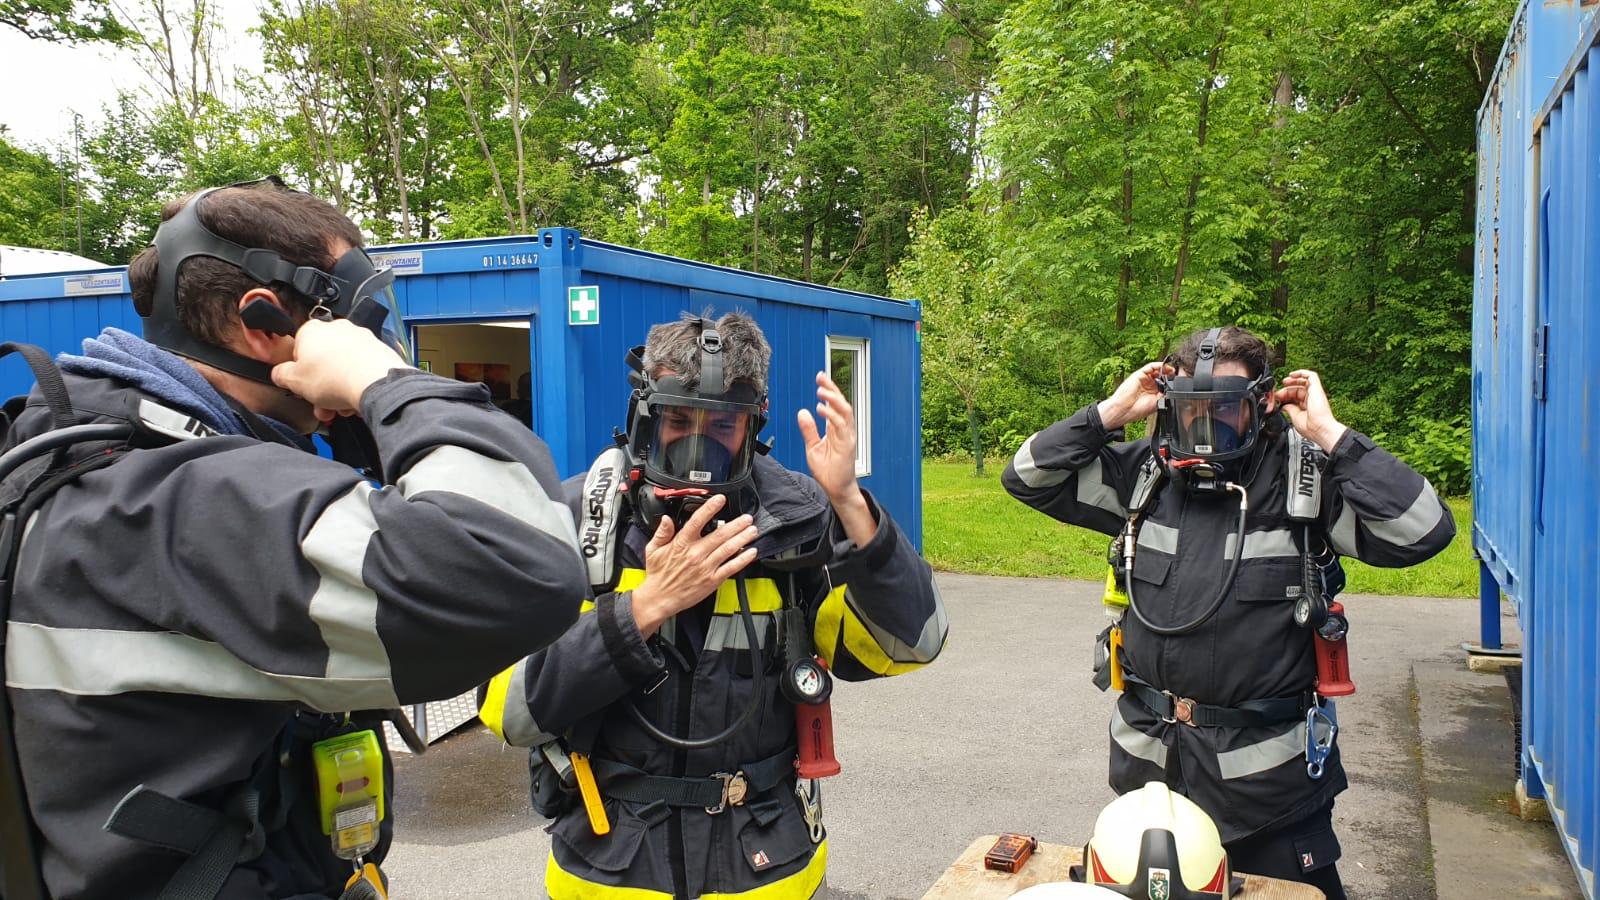 Heißausbildung an der Feuerwehrschule Lebring